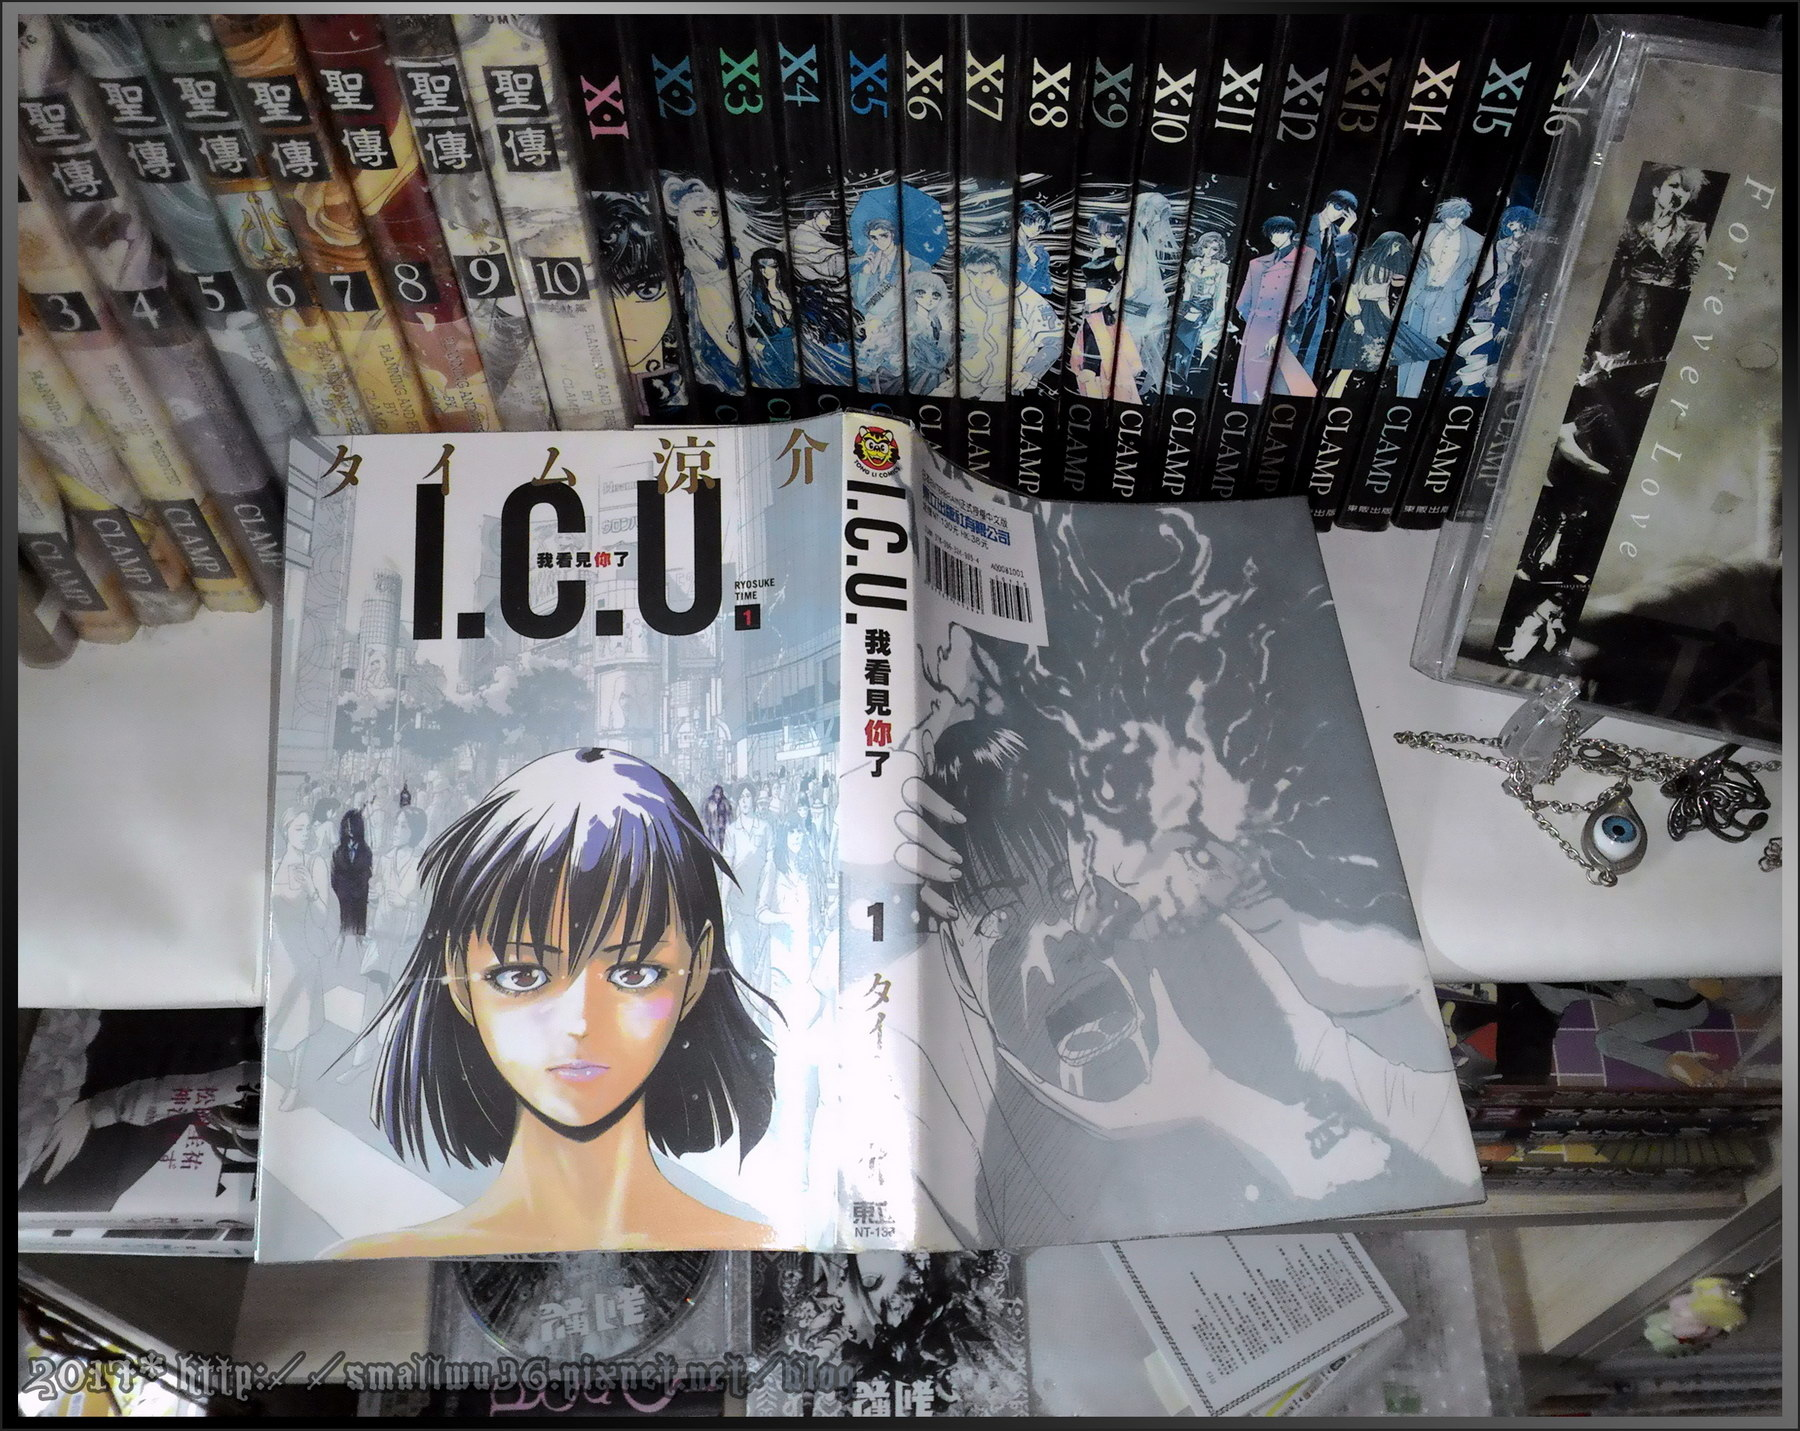 [感想] タイム涼介 《I.C.U.我看見你了》Vol_ 1,東立.jpg